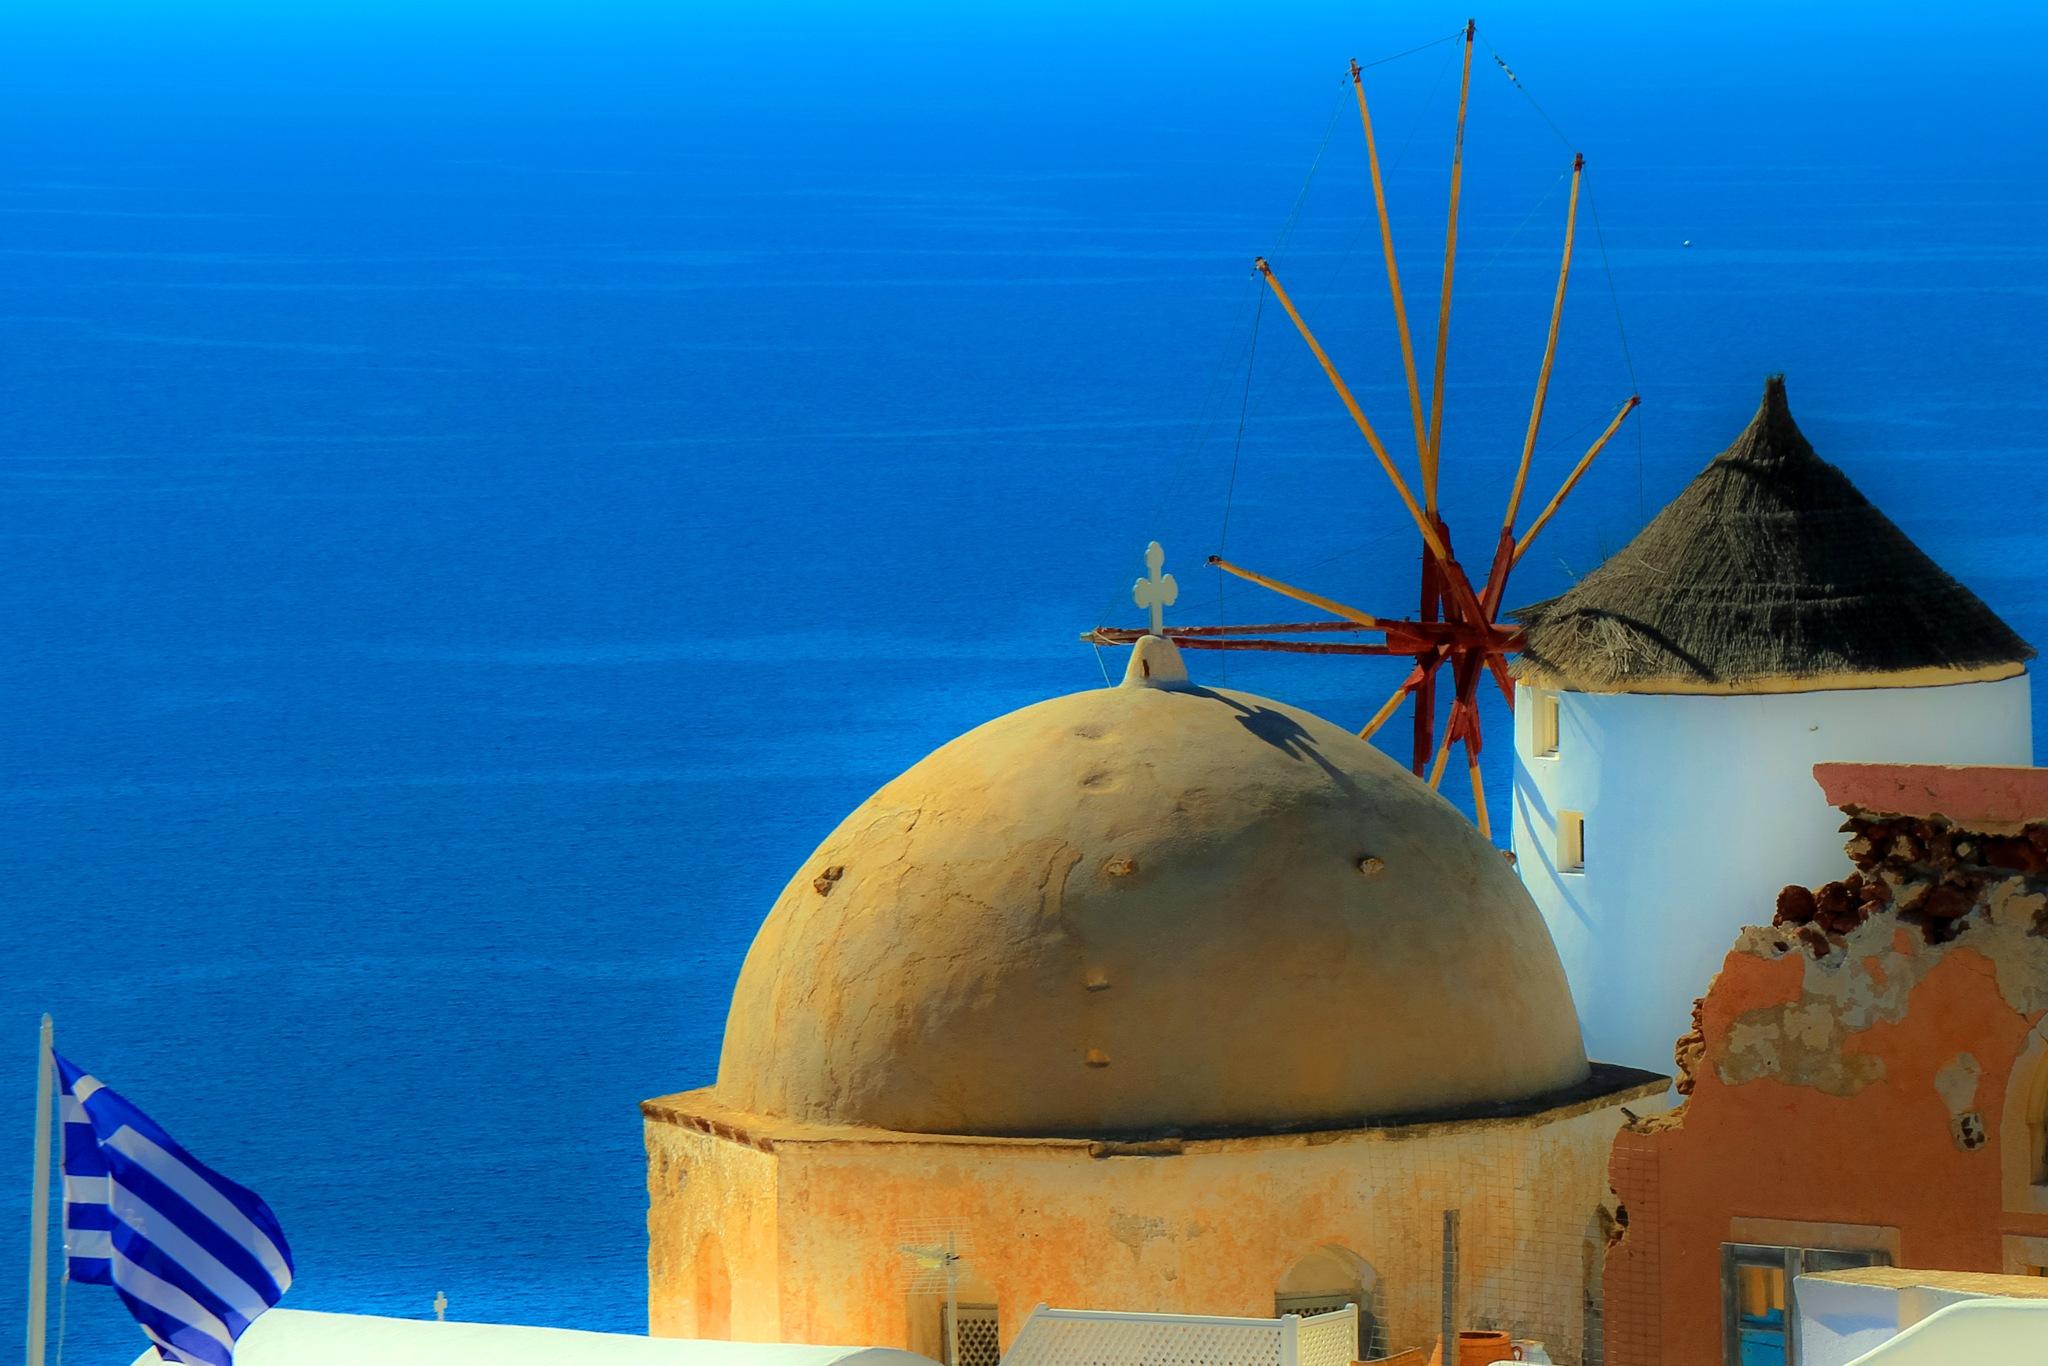 Santorini Church Dome by Martin Roper